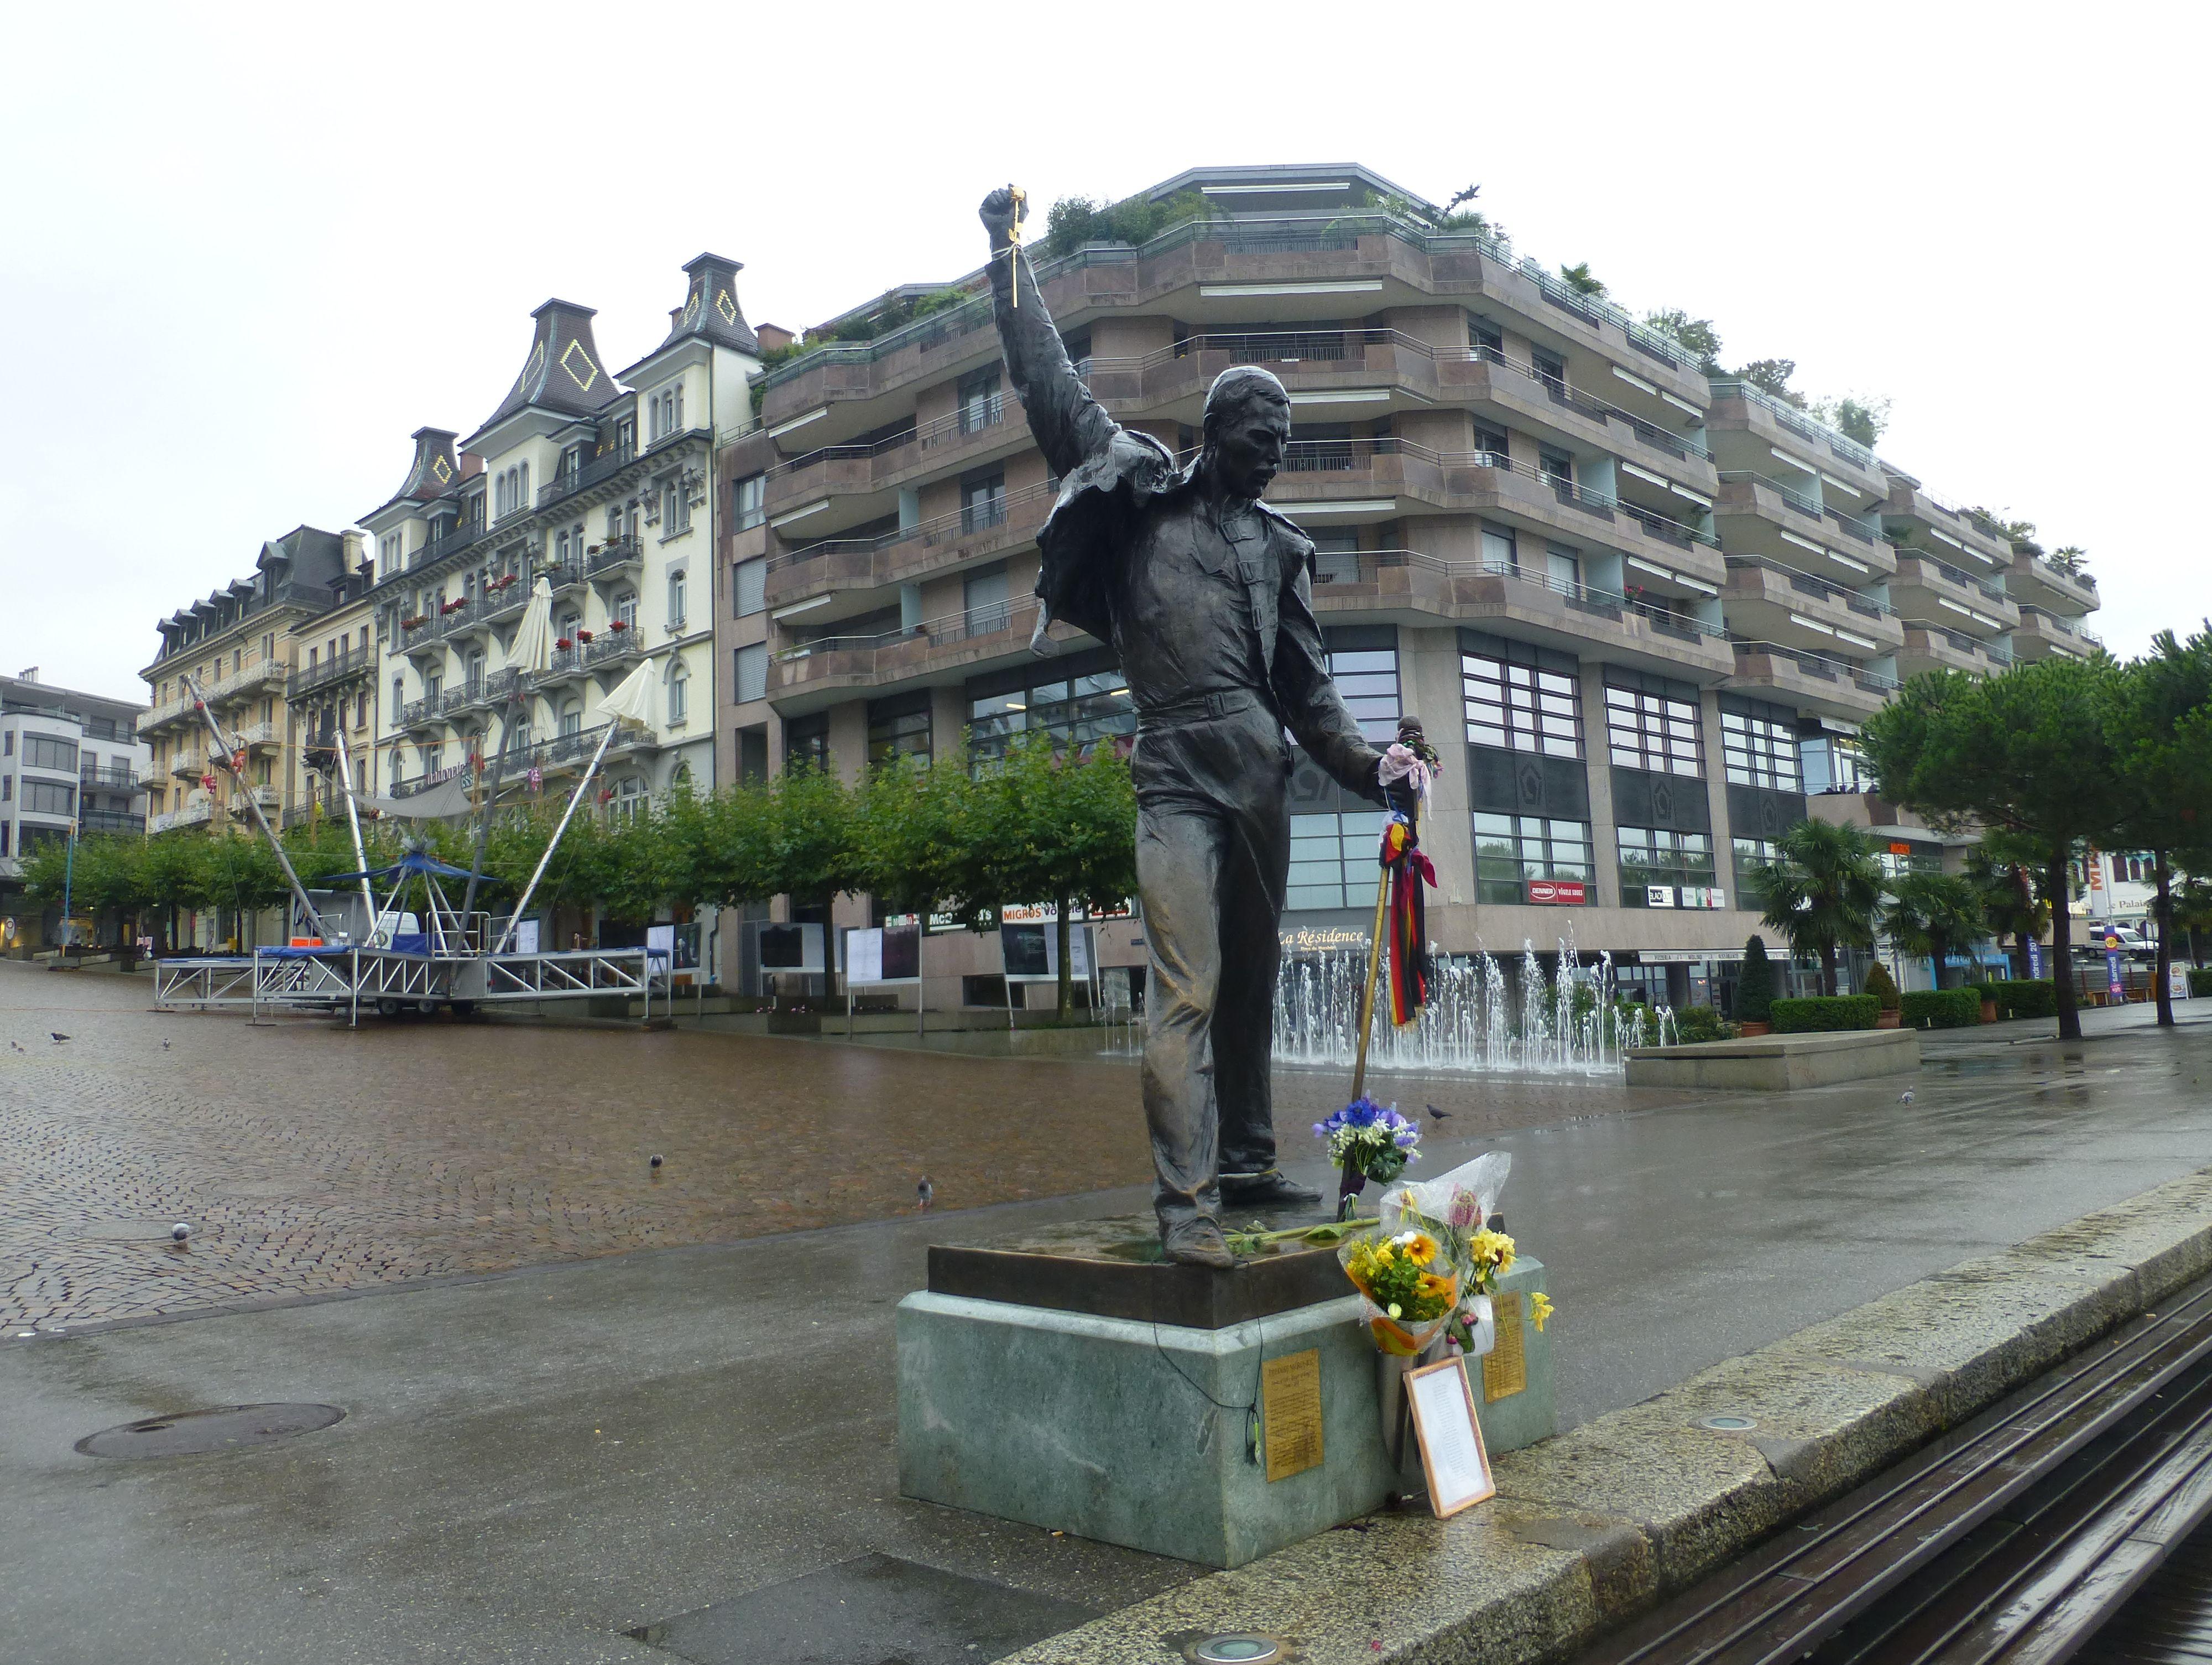 Montreux.jpg